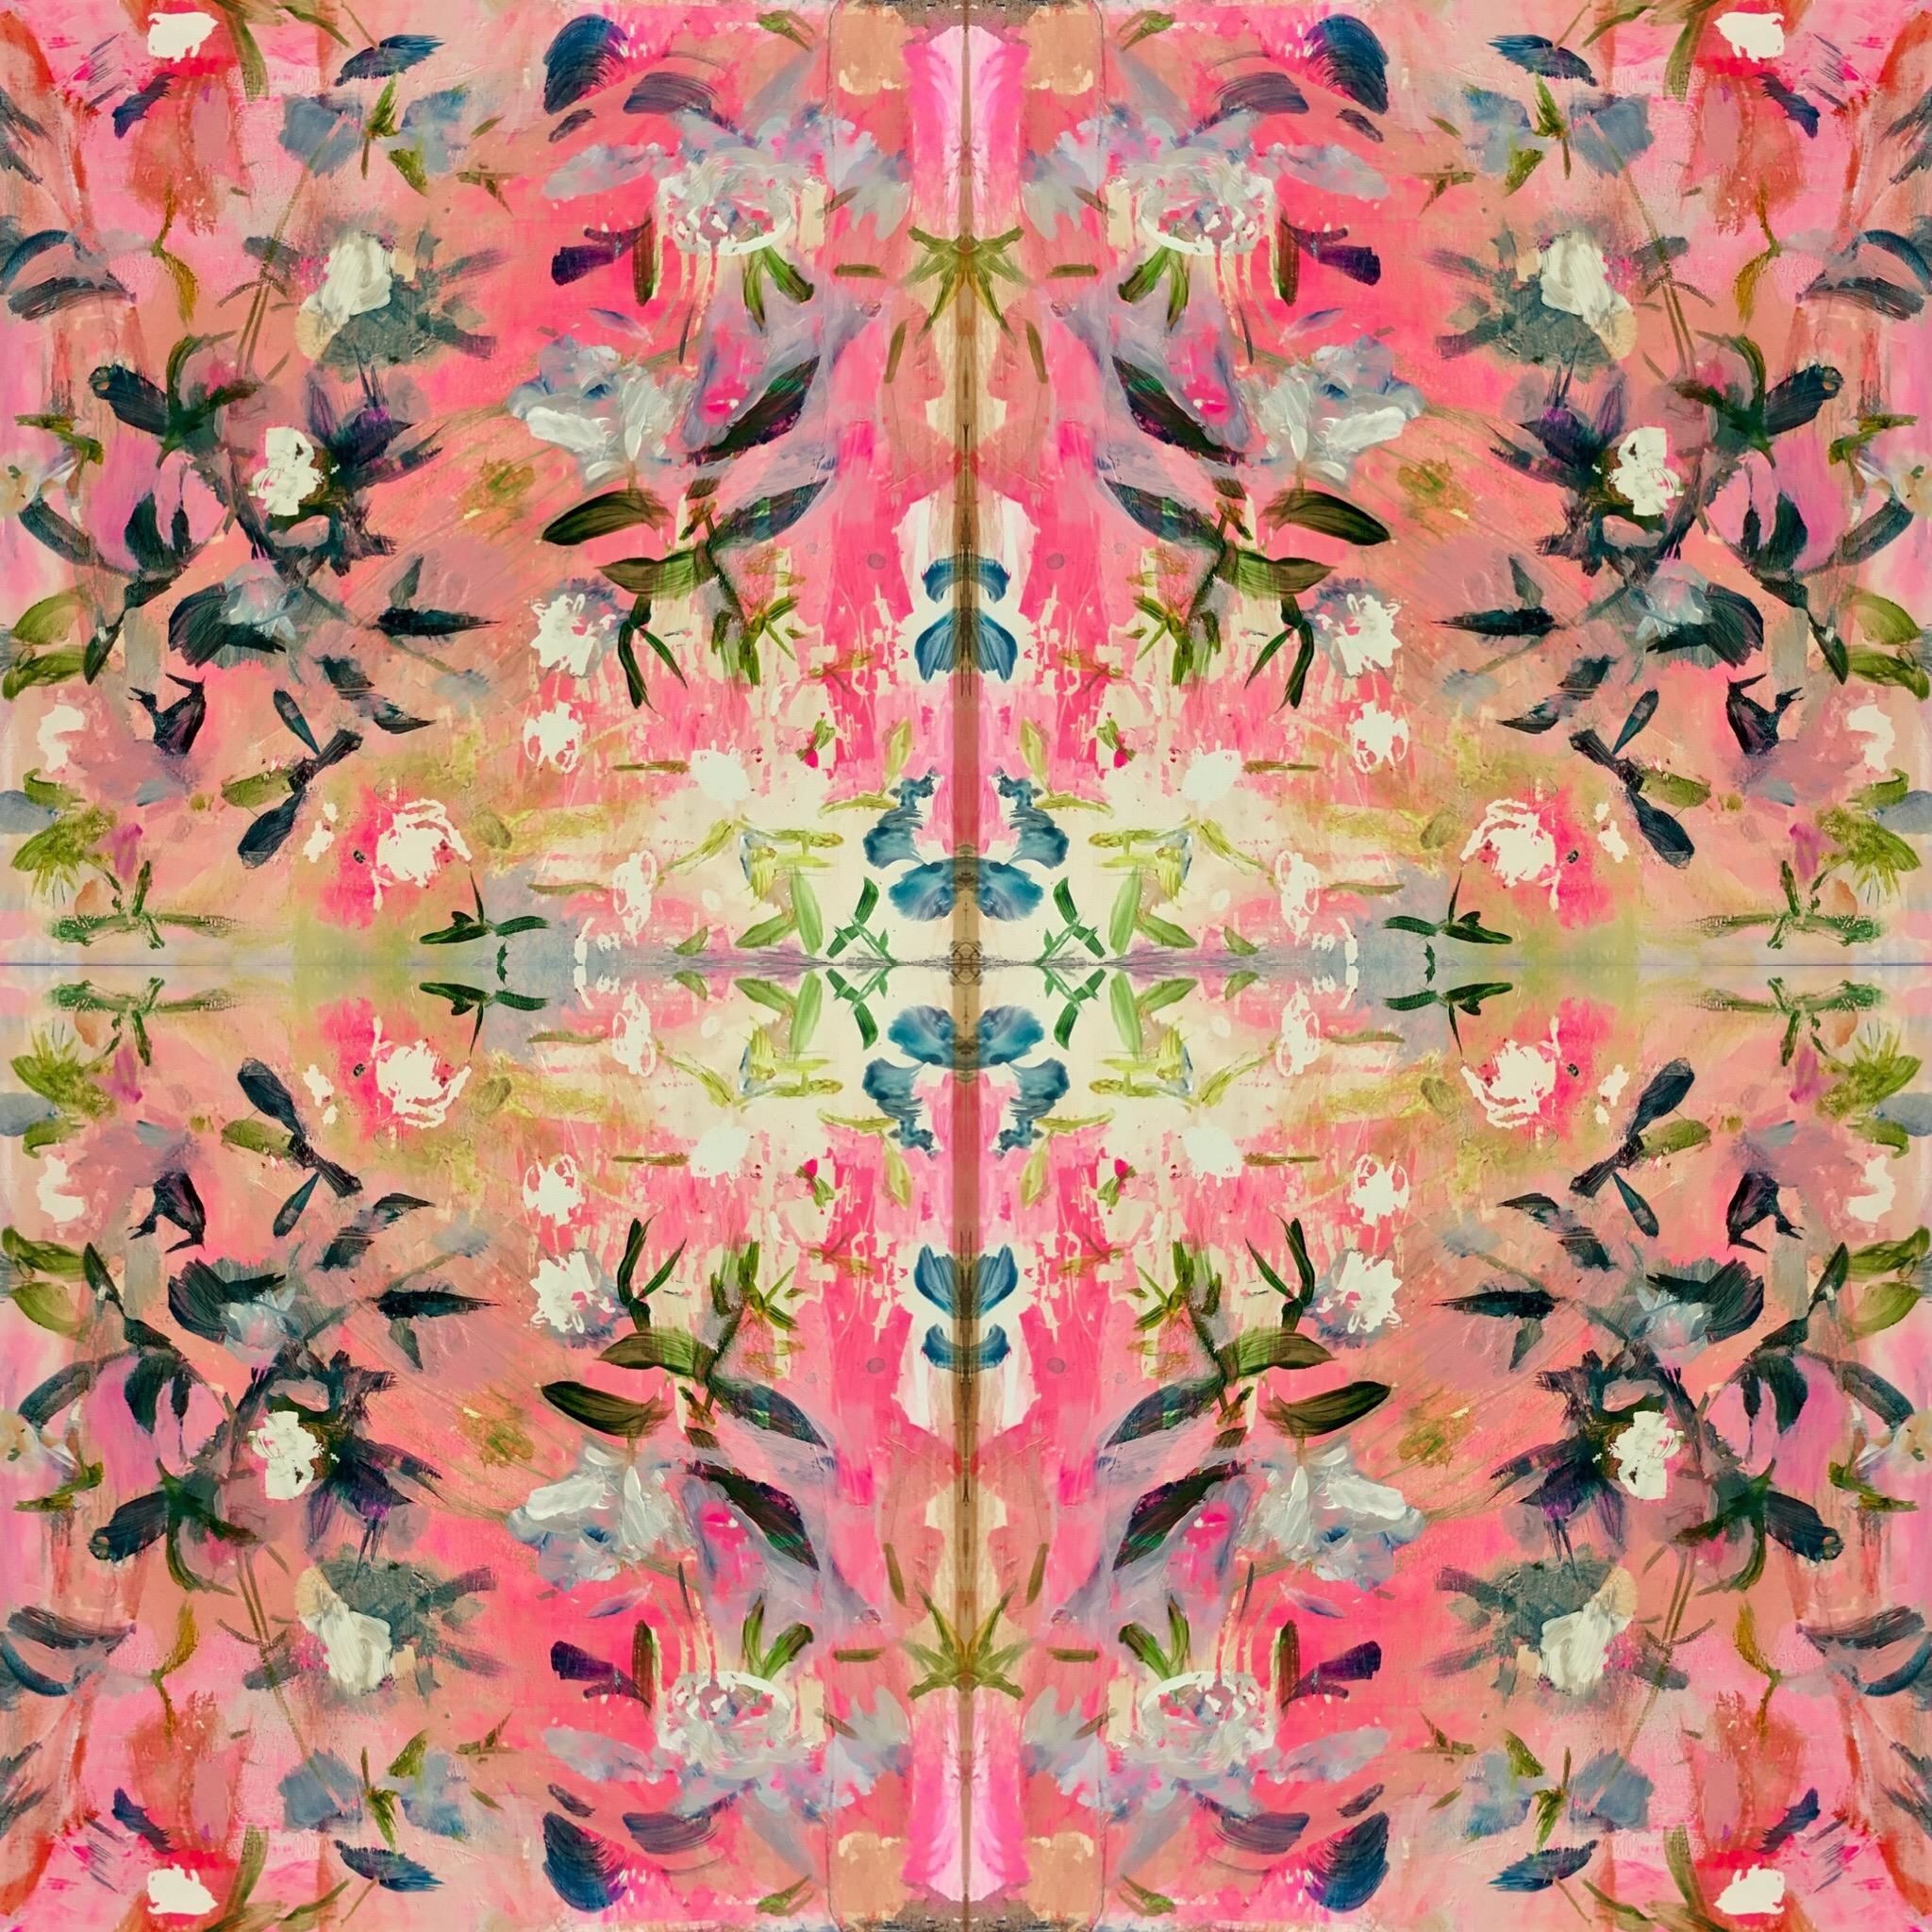 floral pattern repeat textile wallpaper houzz dwell elle decor